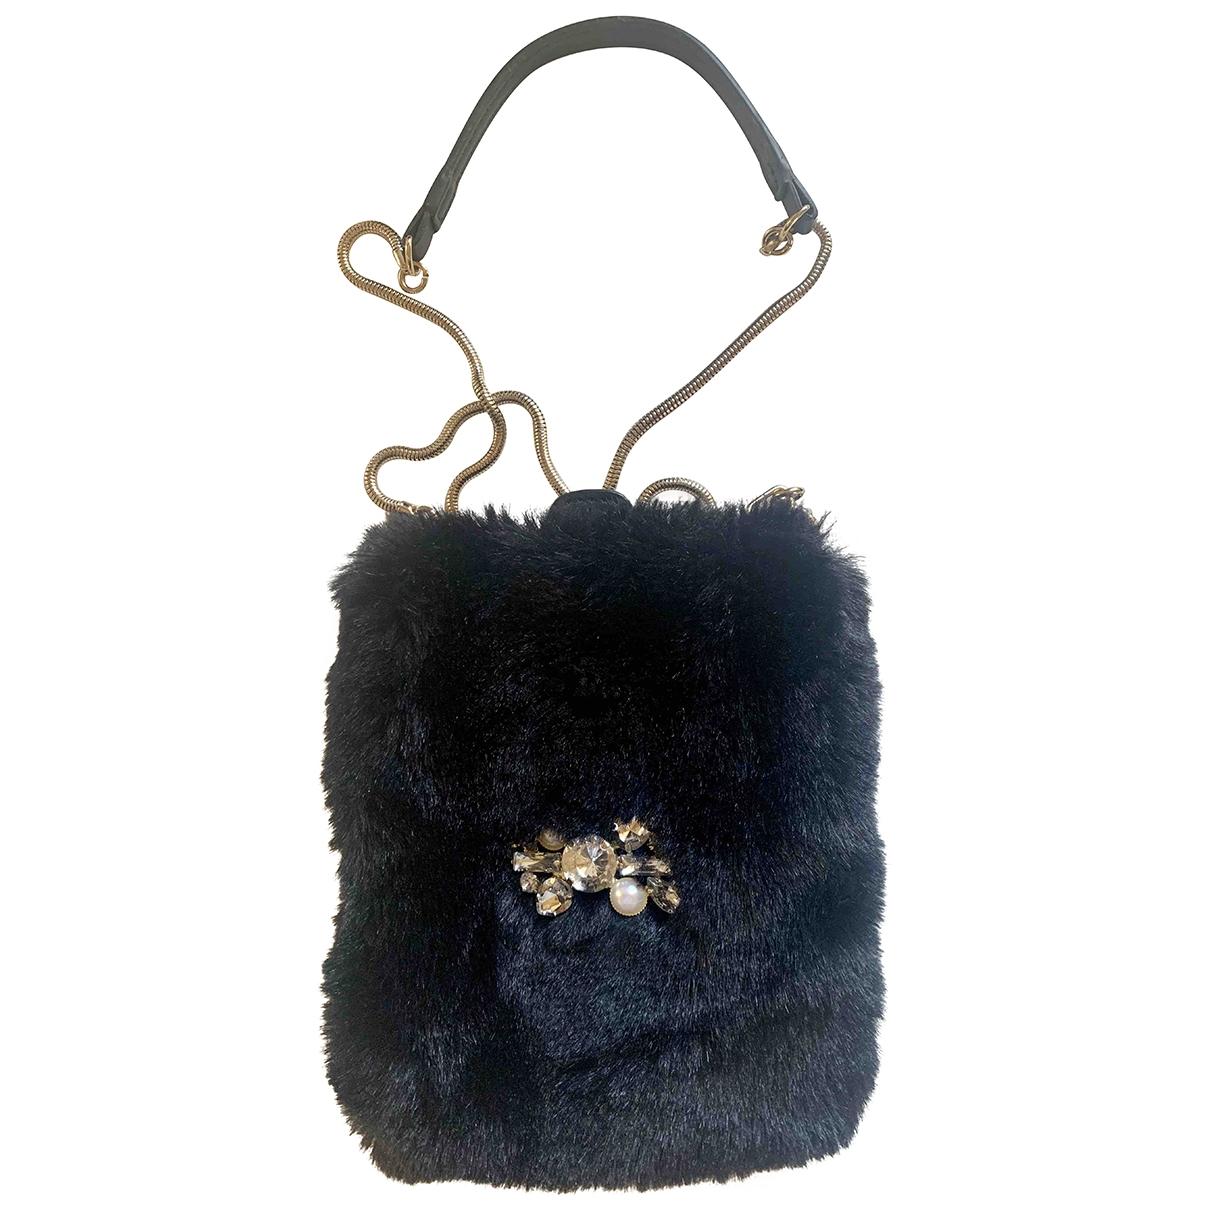 Zara \N Black Faux fur handbag for Women \N